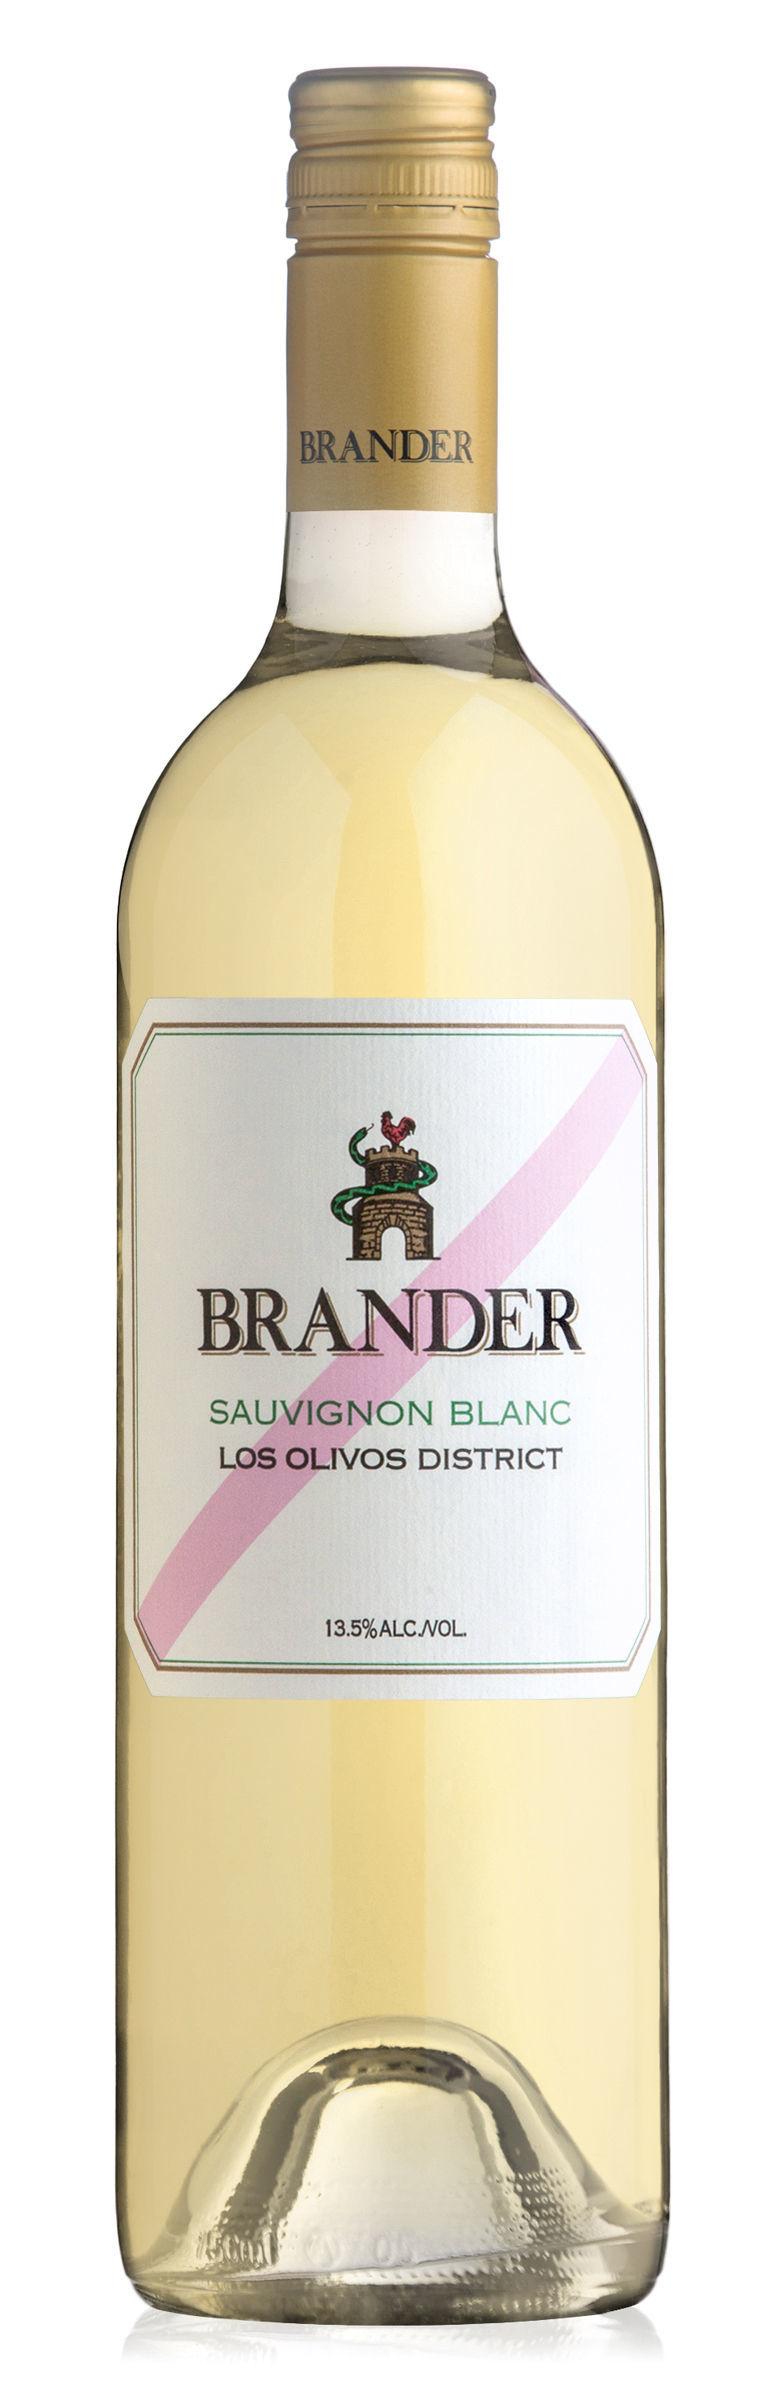 42nd vintage of Brander Vineyard's flagship sauvignon blanc